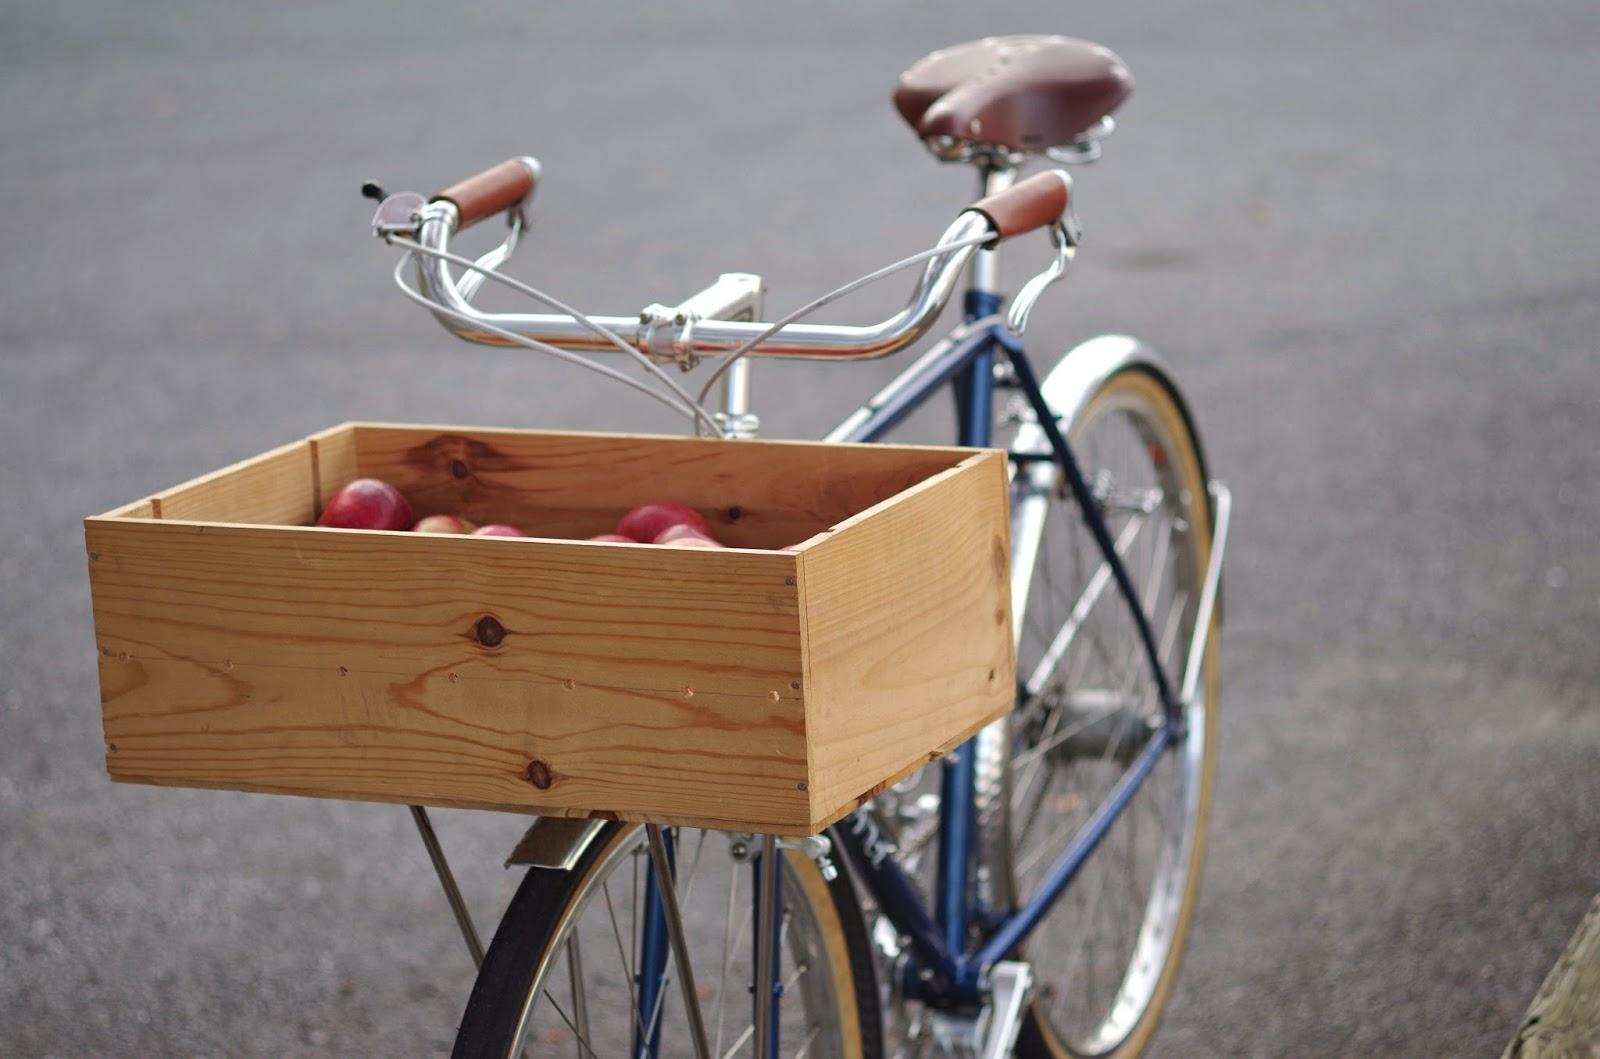 The Velo Orange Blog Wine Crate Bike Basket A Diy Bike Project